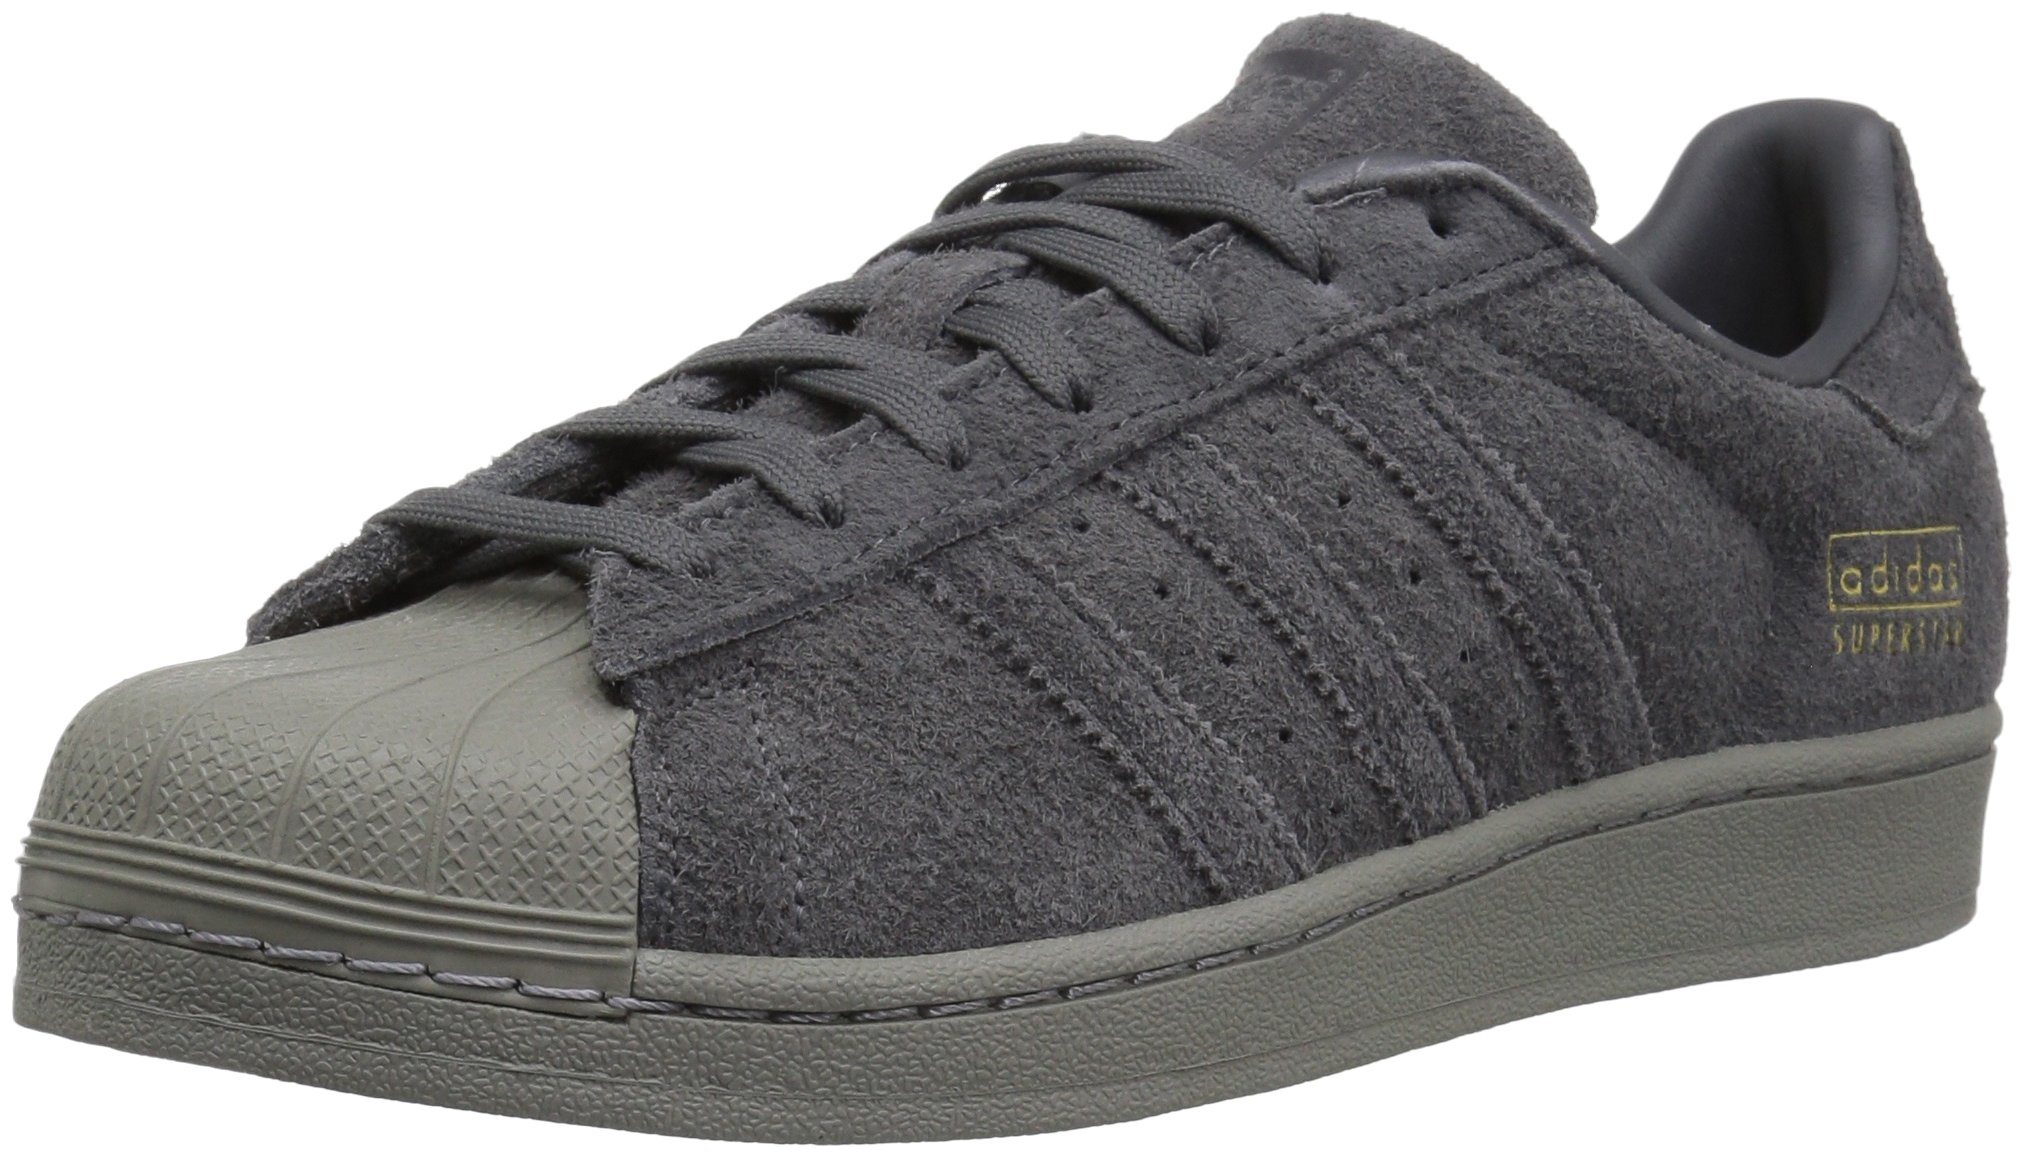 adidas Originals Men's Superstar Running Shoe, Grey Five Utility Black, 10.5 Medium US